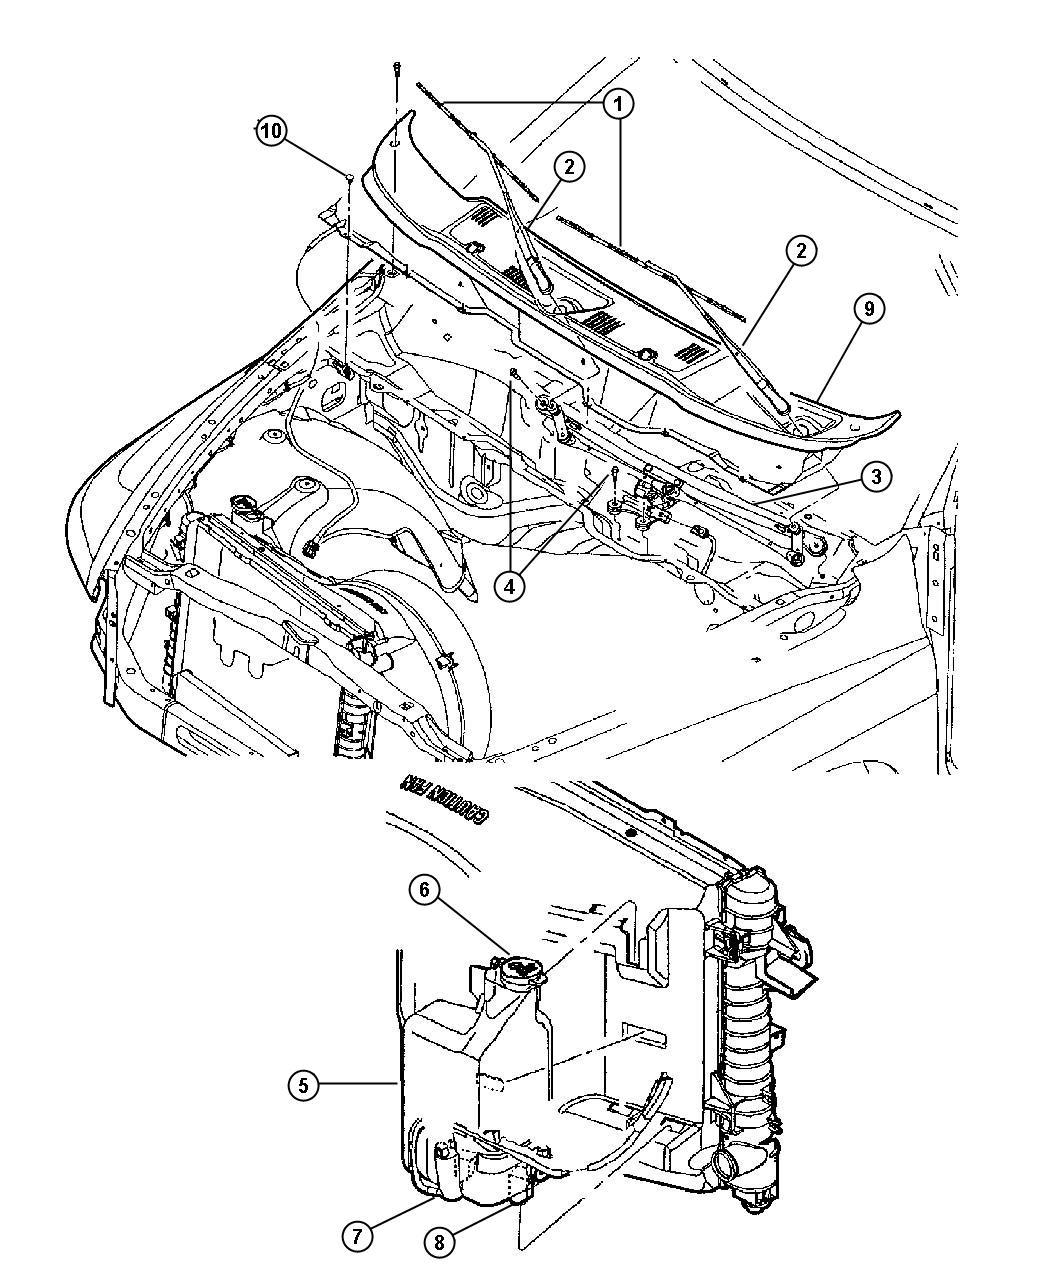 2011 Jeep Patriot Bottle  Coolant Reserve  U0026 Washer Fl  With Washer Reservoir